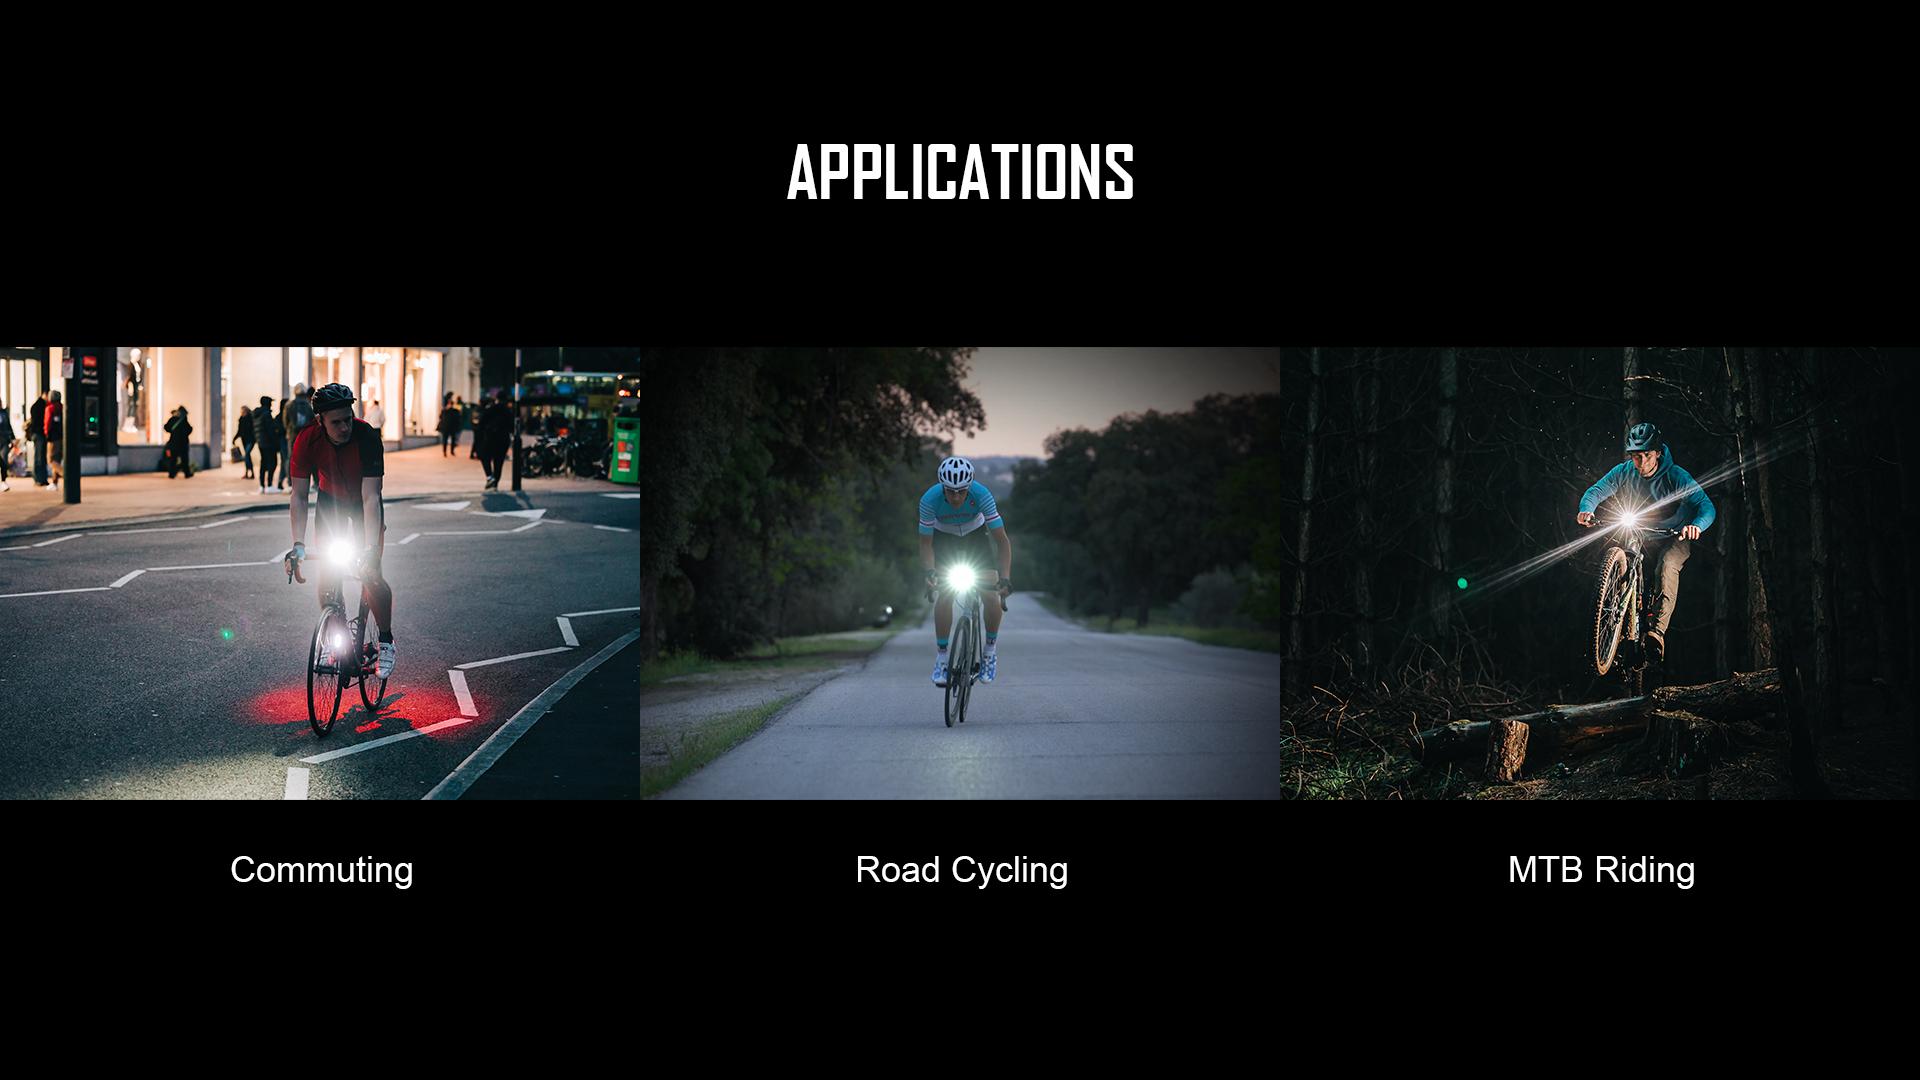 RN1500 Multi-application Usage